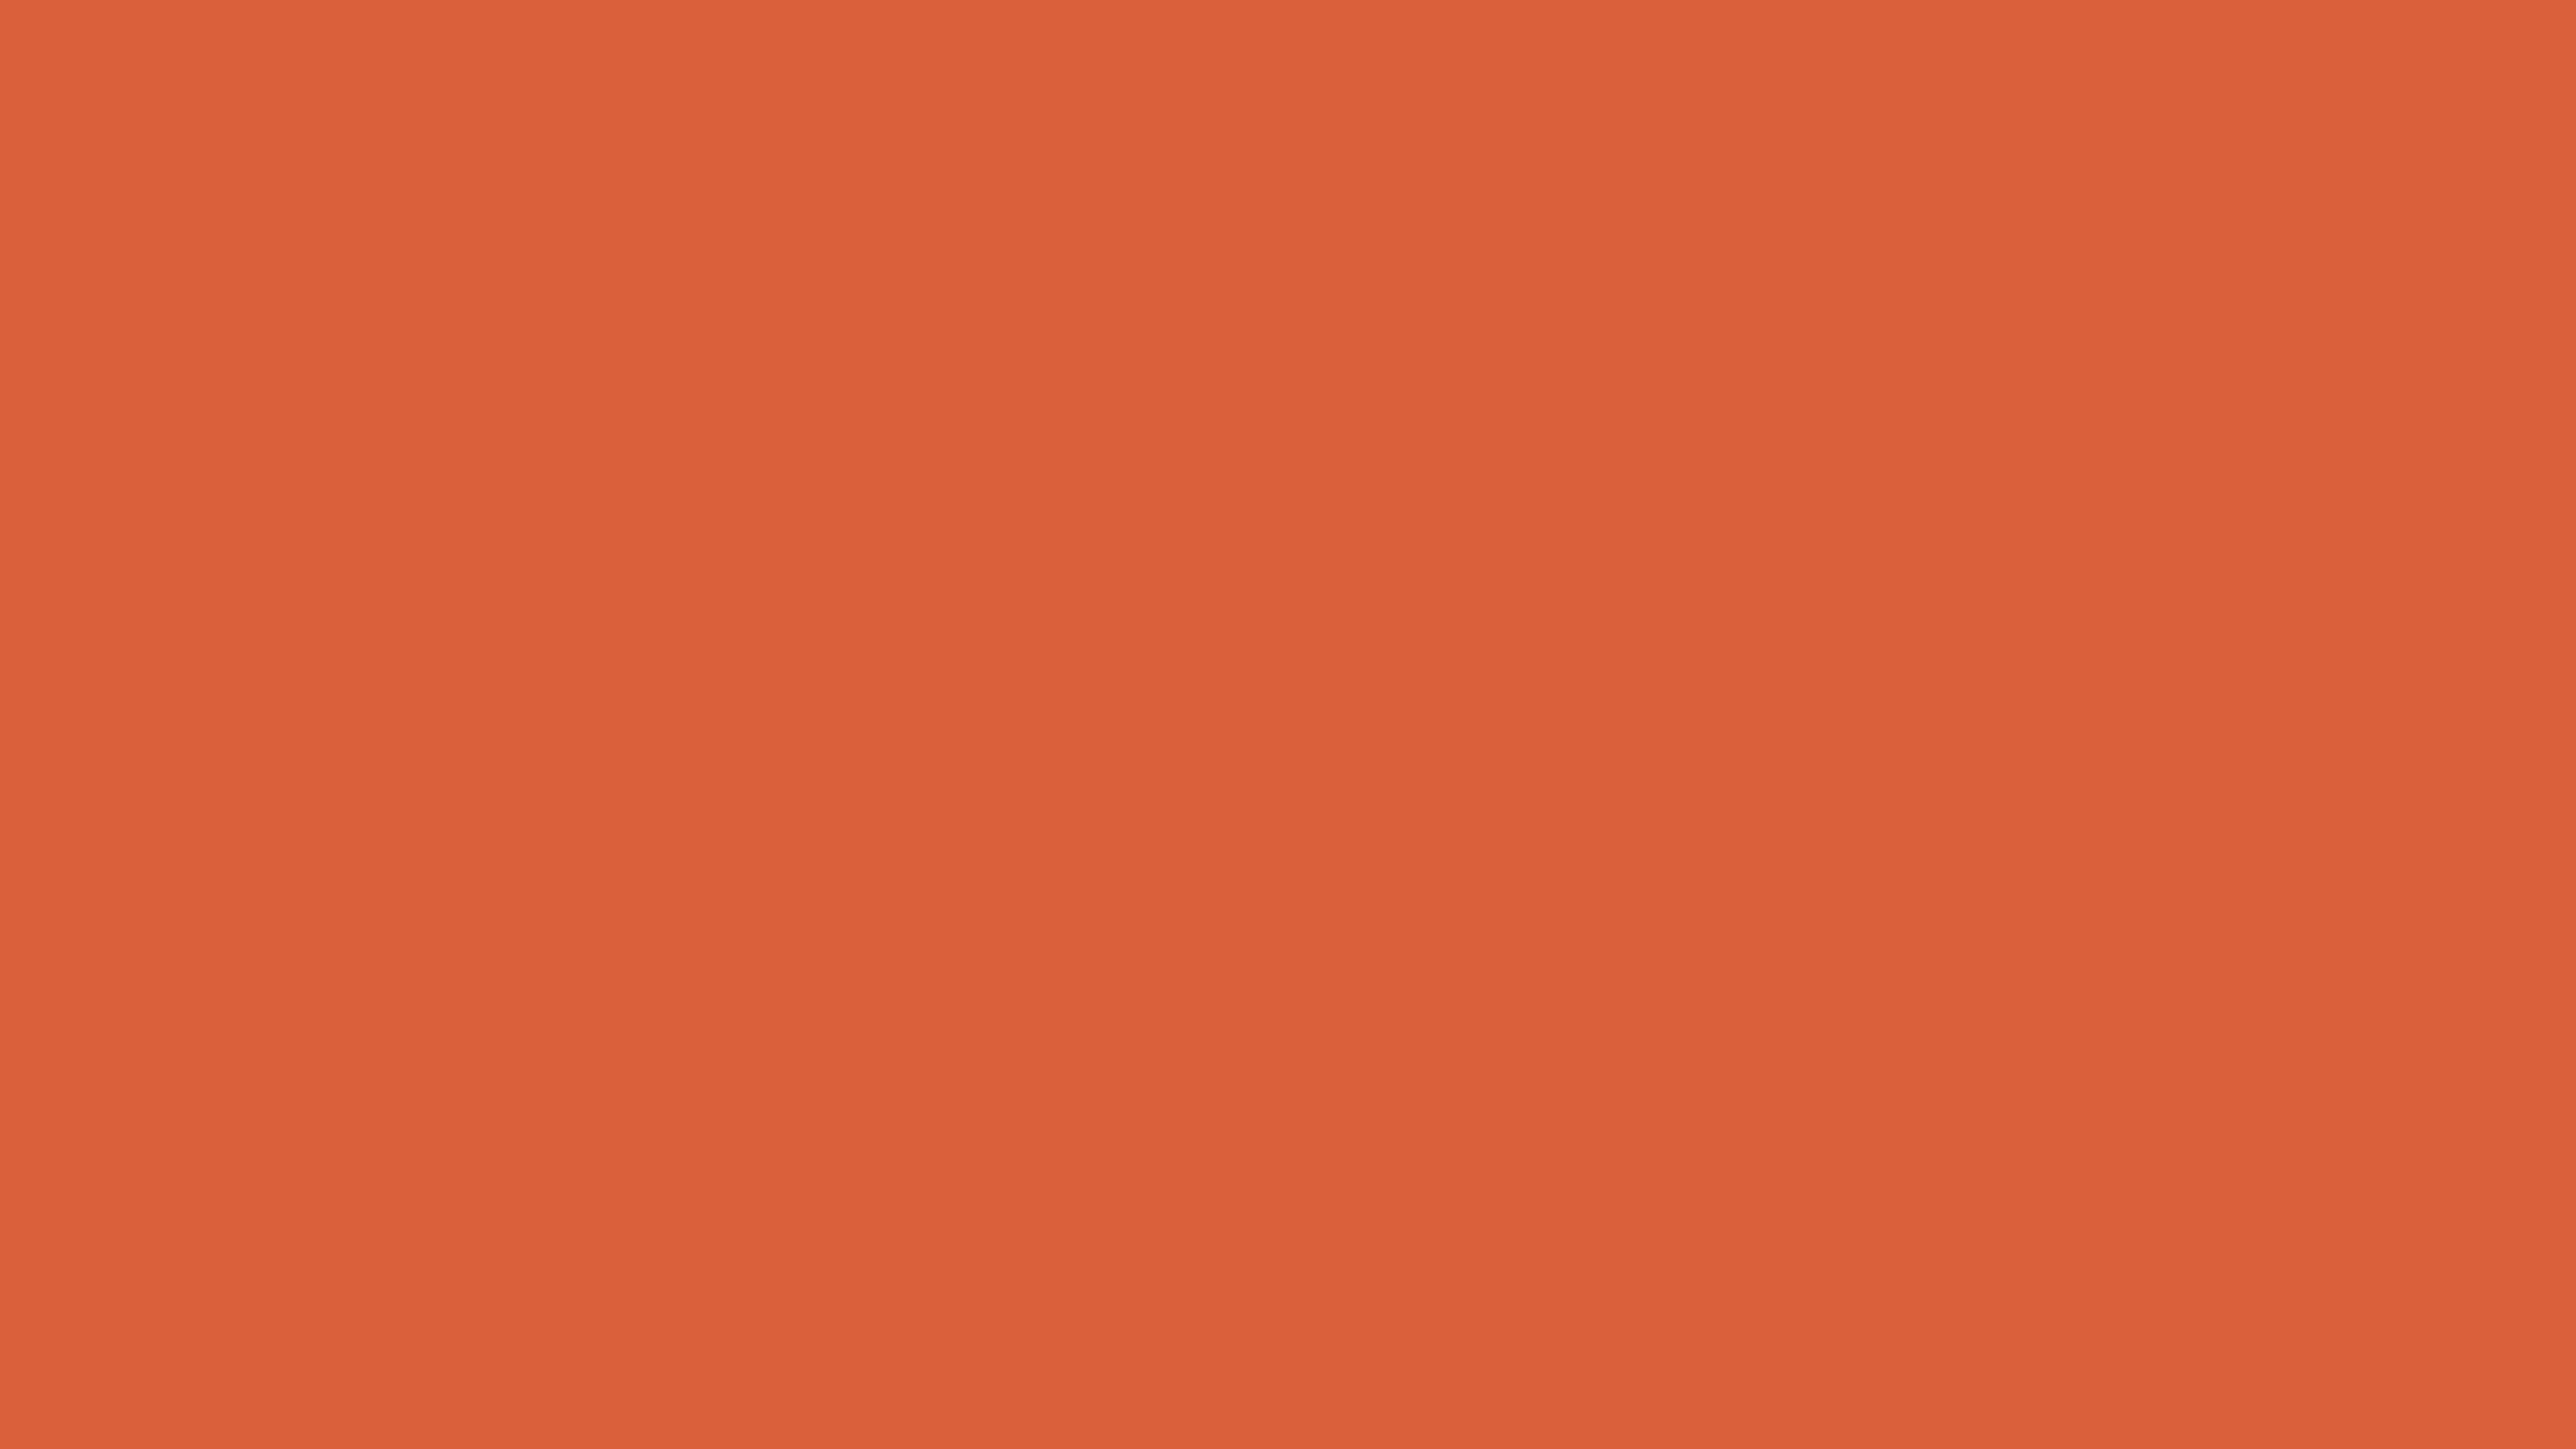 5120x2880 Medium Vermilion Solid Color Background